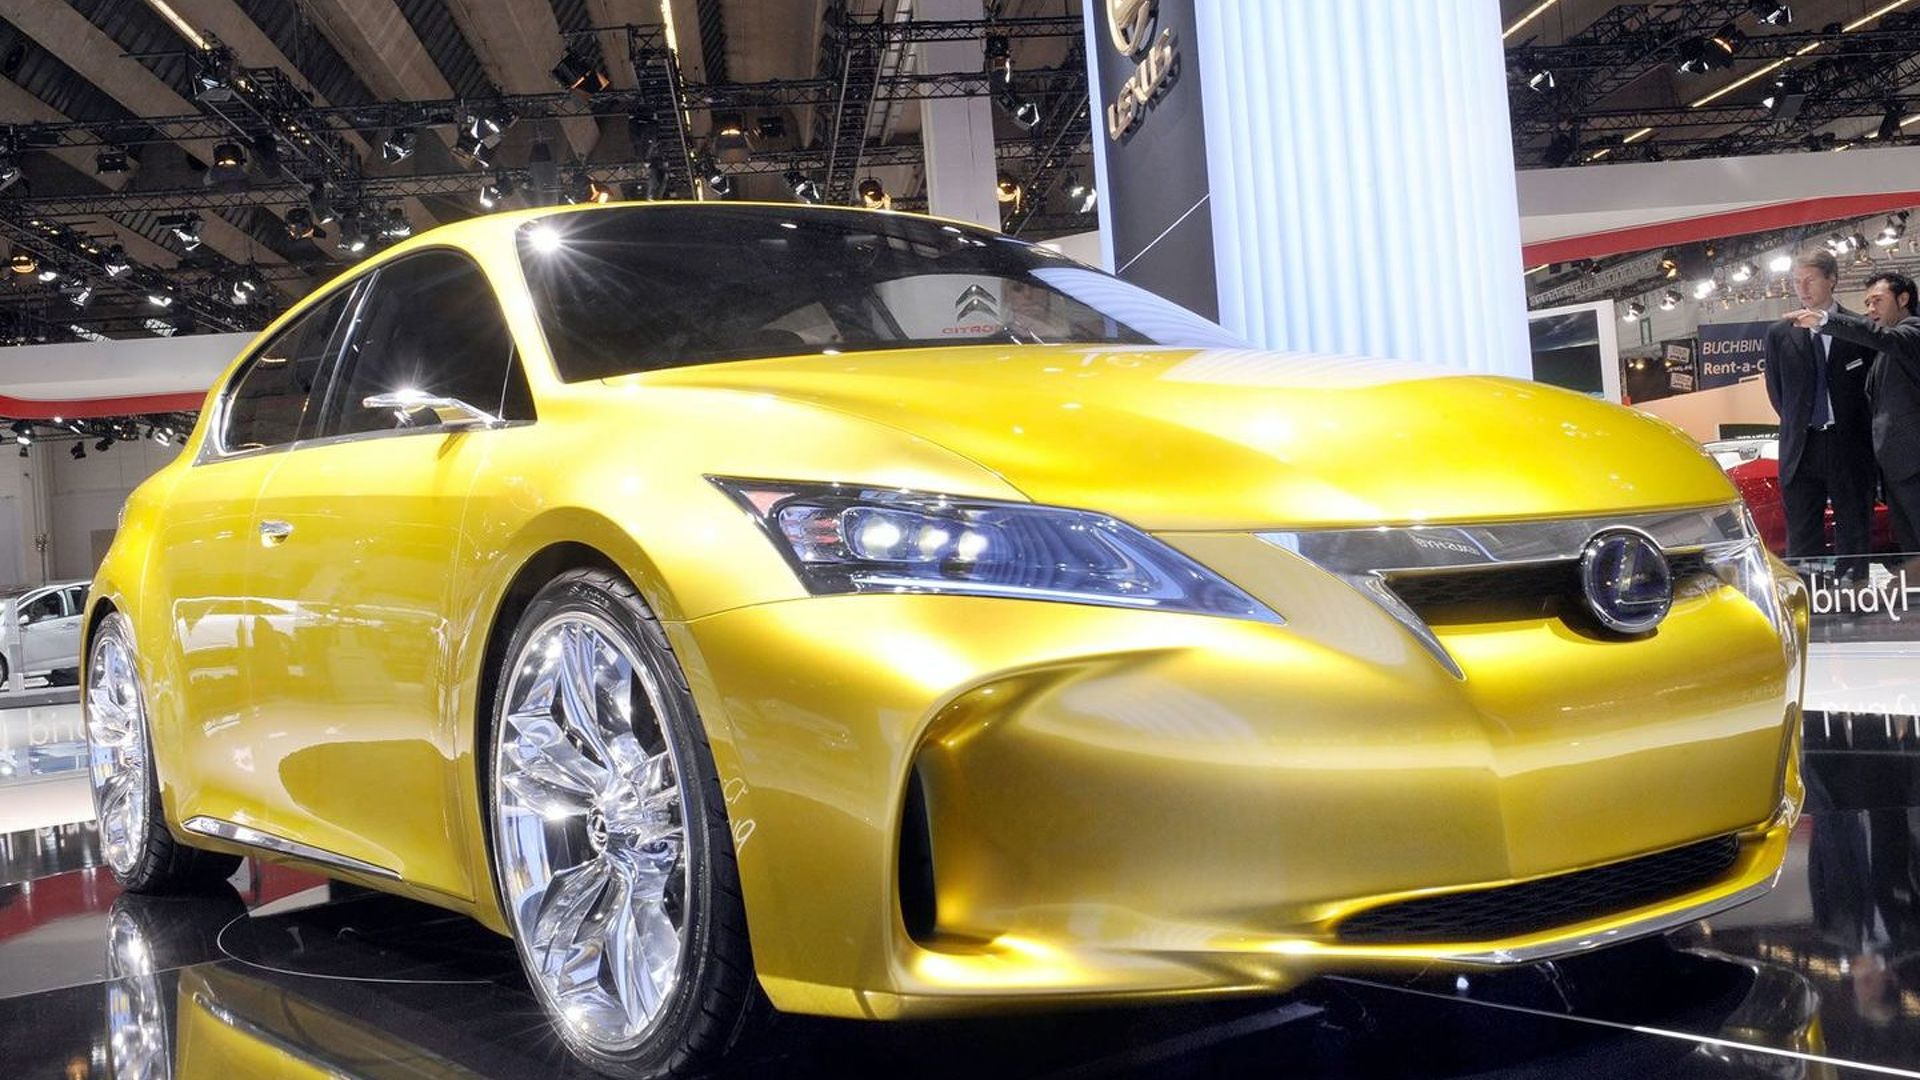 https://icdn-8.motor1.com/images/mgl/nyMRG/s1/2009-182409-lexus-lf-ch-full-hybrid-concept-world-debut-at-2009-frankfurt-motor-show1.jpg